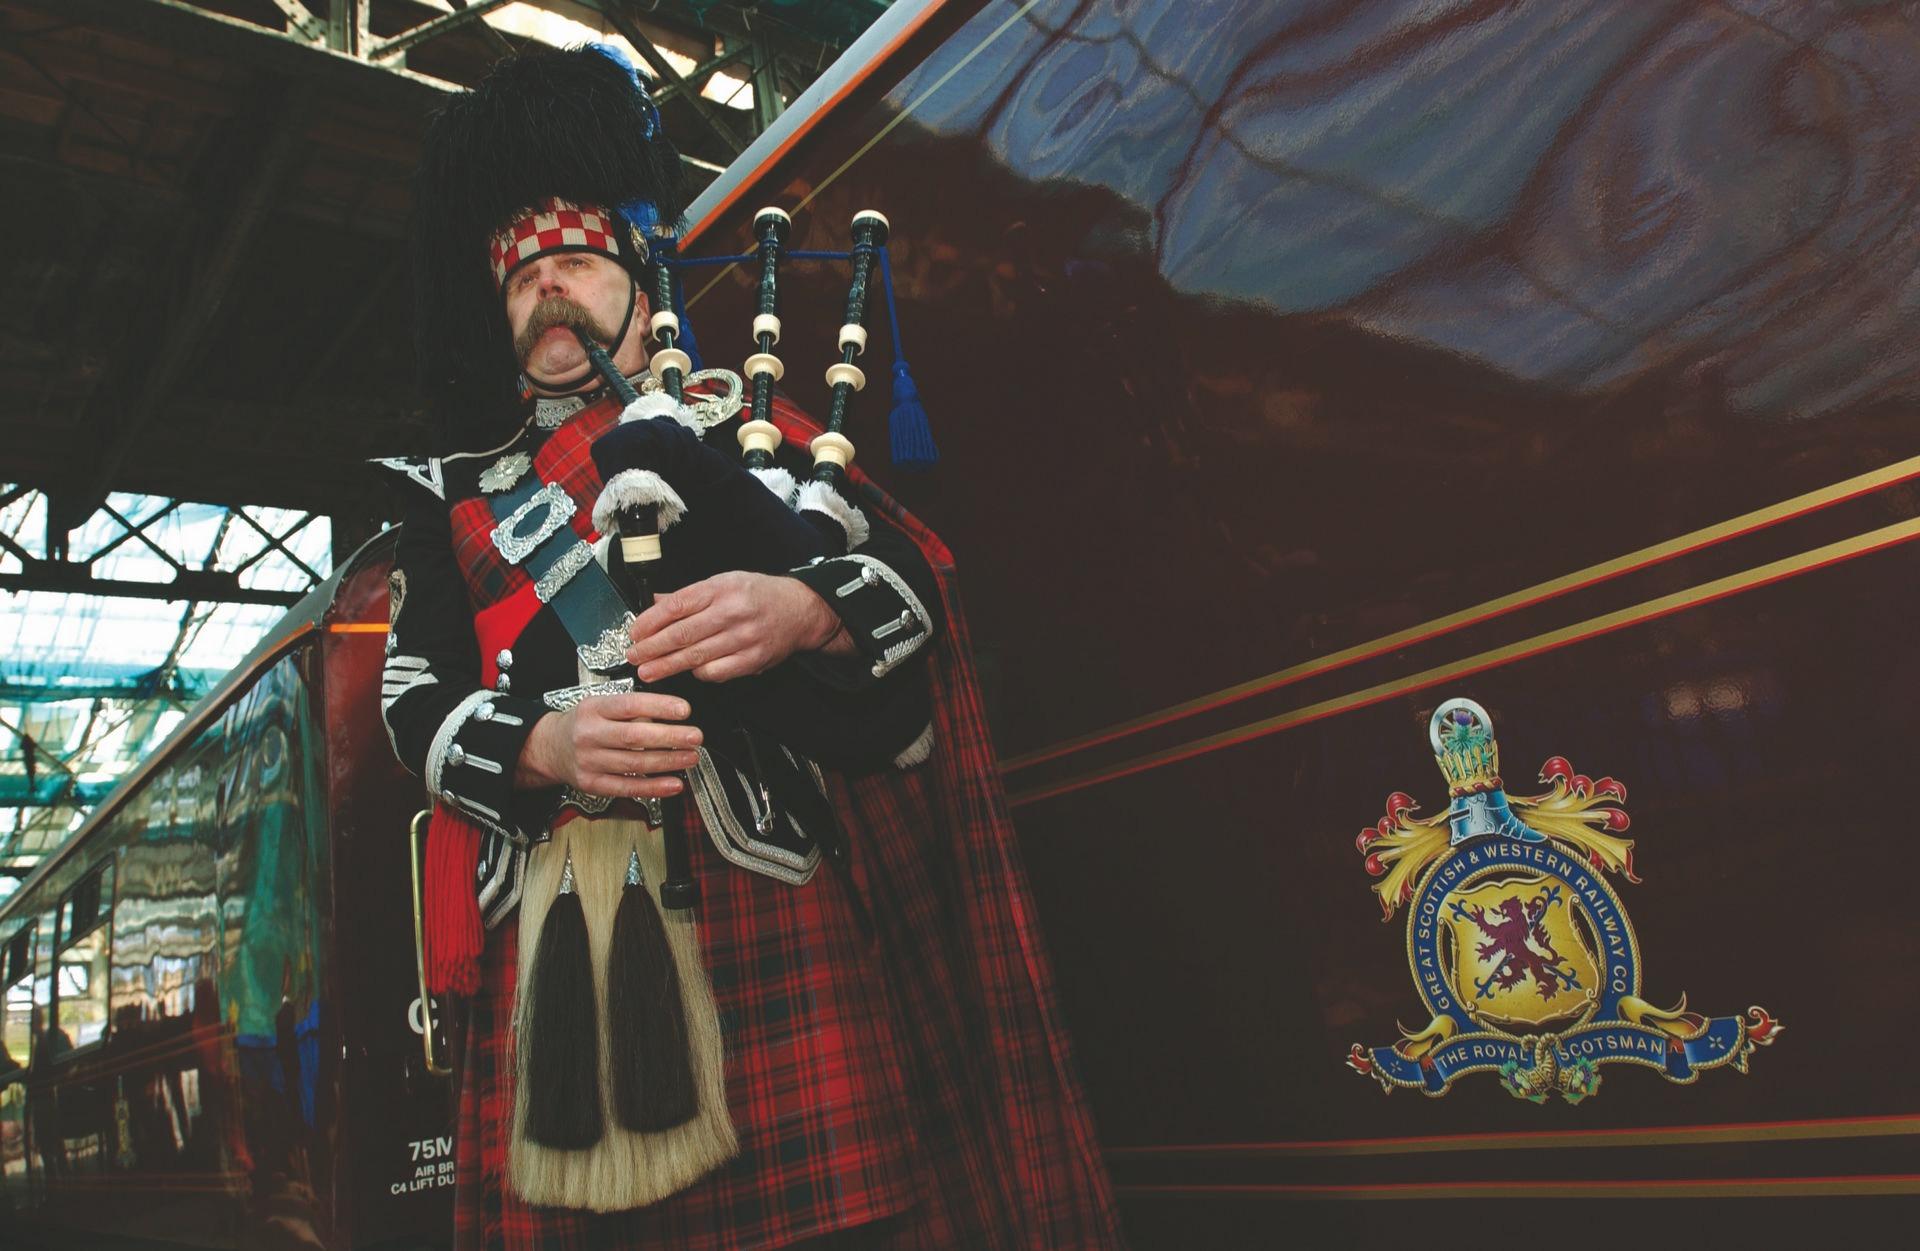 NOMAD-luksusowe-pociągi-Belmond-Royal-Scotsman-01-1